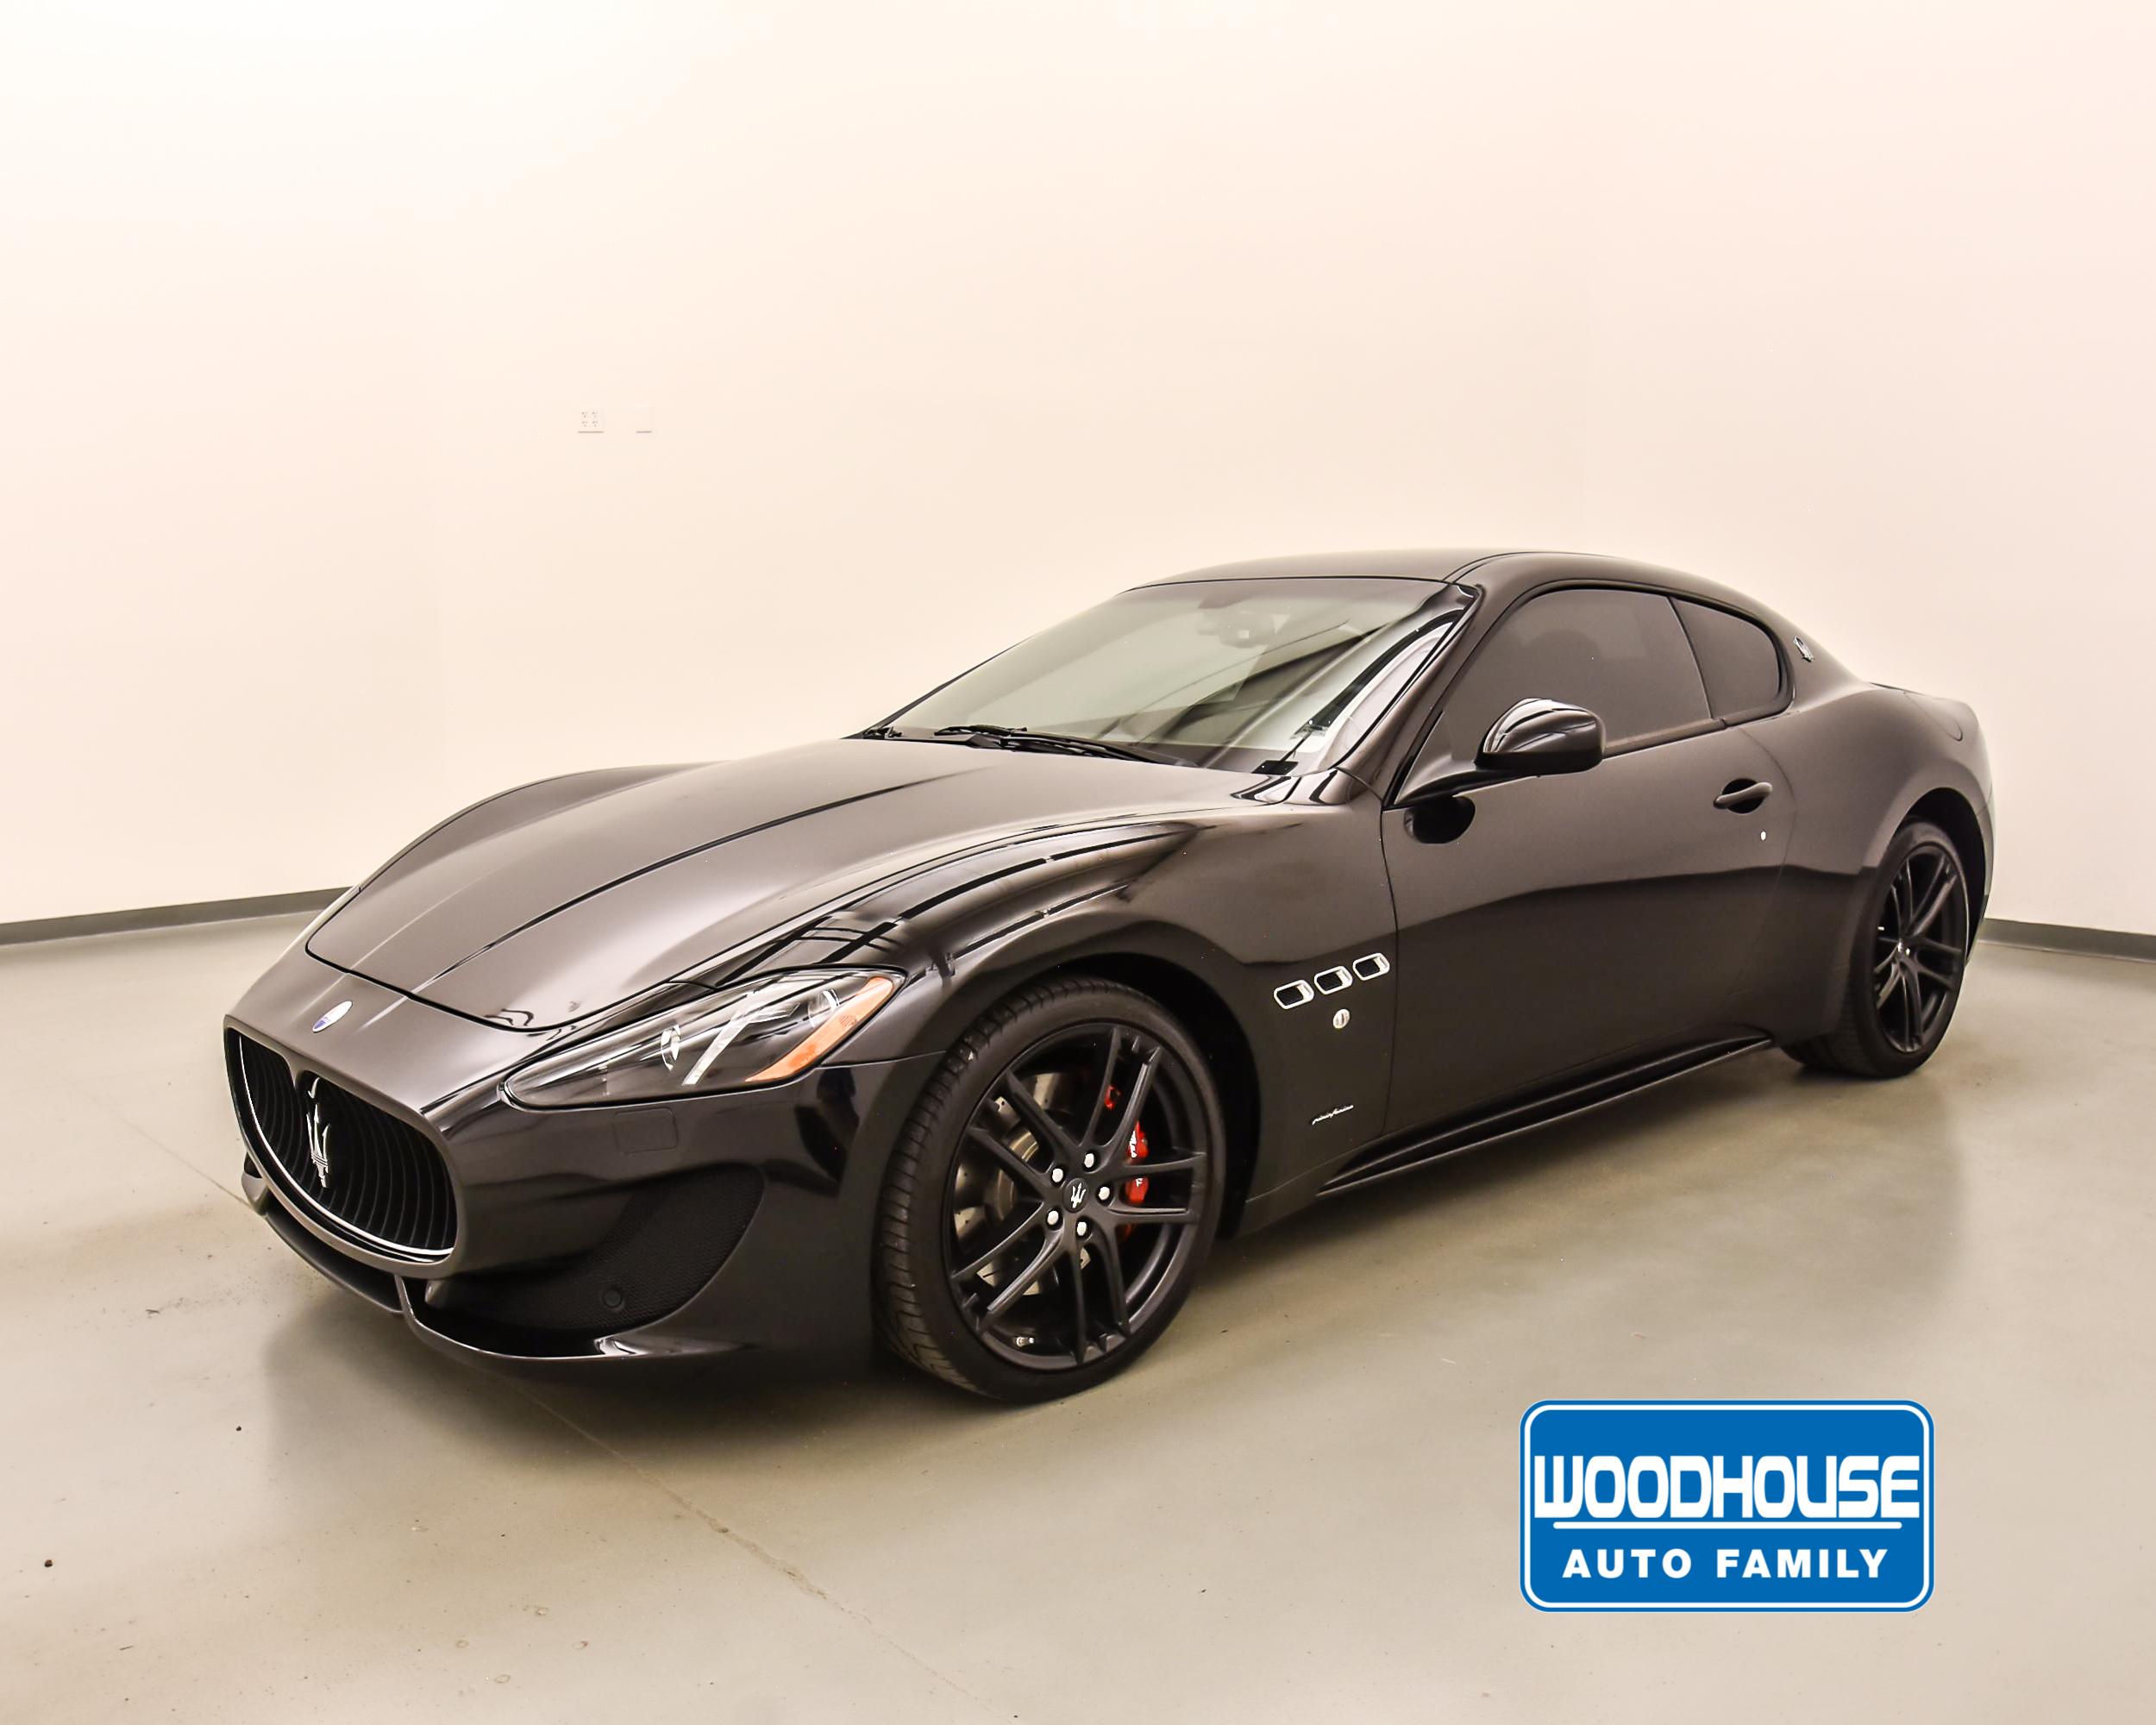 Woodhouse Hyundai Omaha >> Woodhouse | Used 2017 Maserati Granturismo For Sale | Porsche (Omaha)